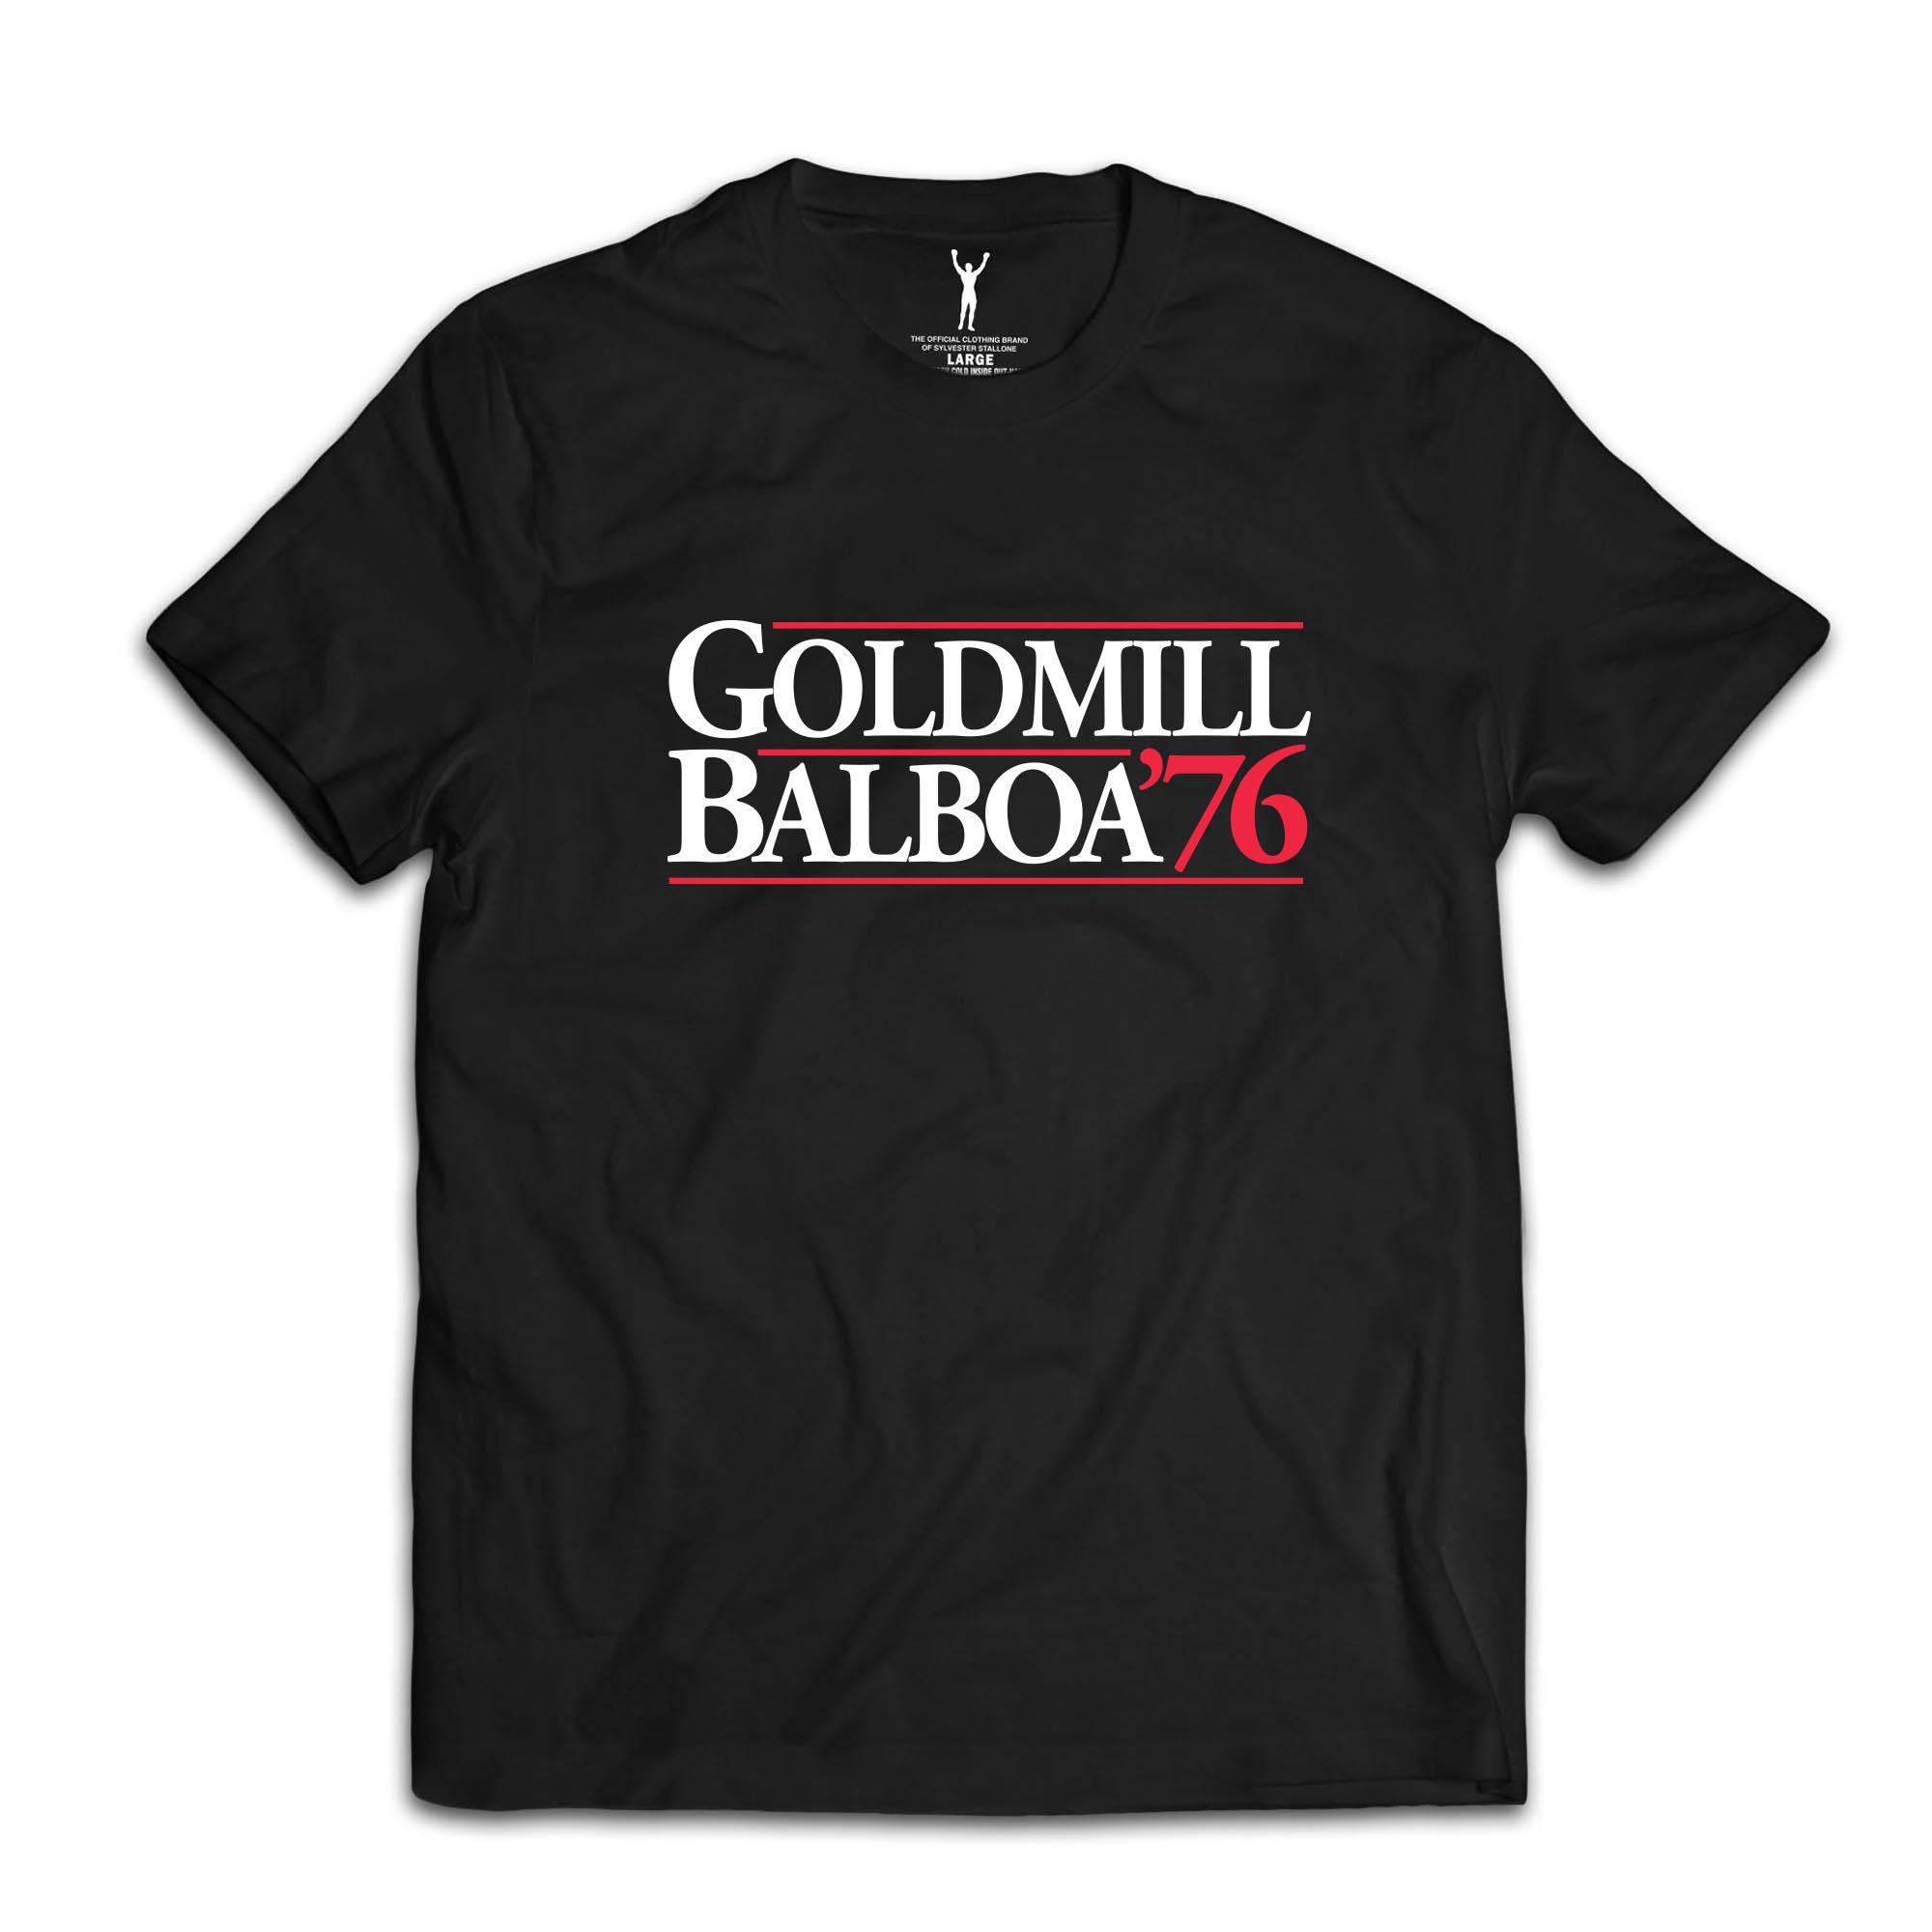 Goldmill Balboa '76 Tee